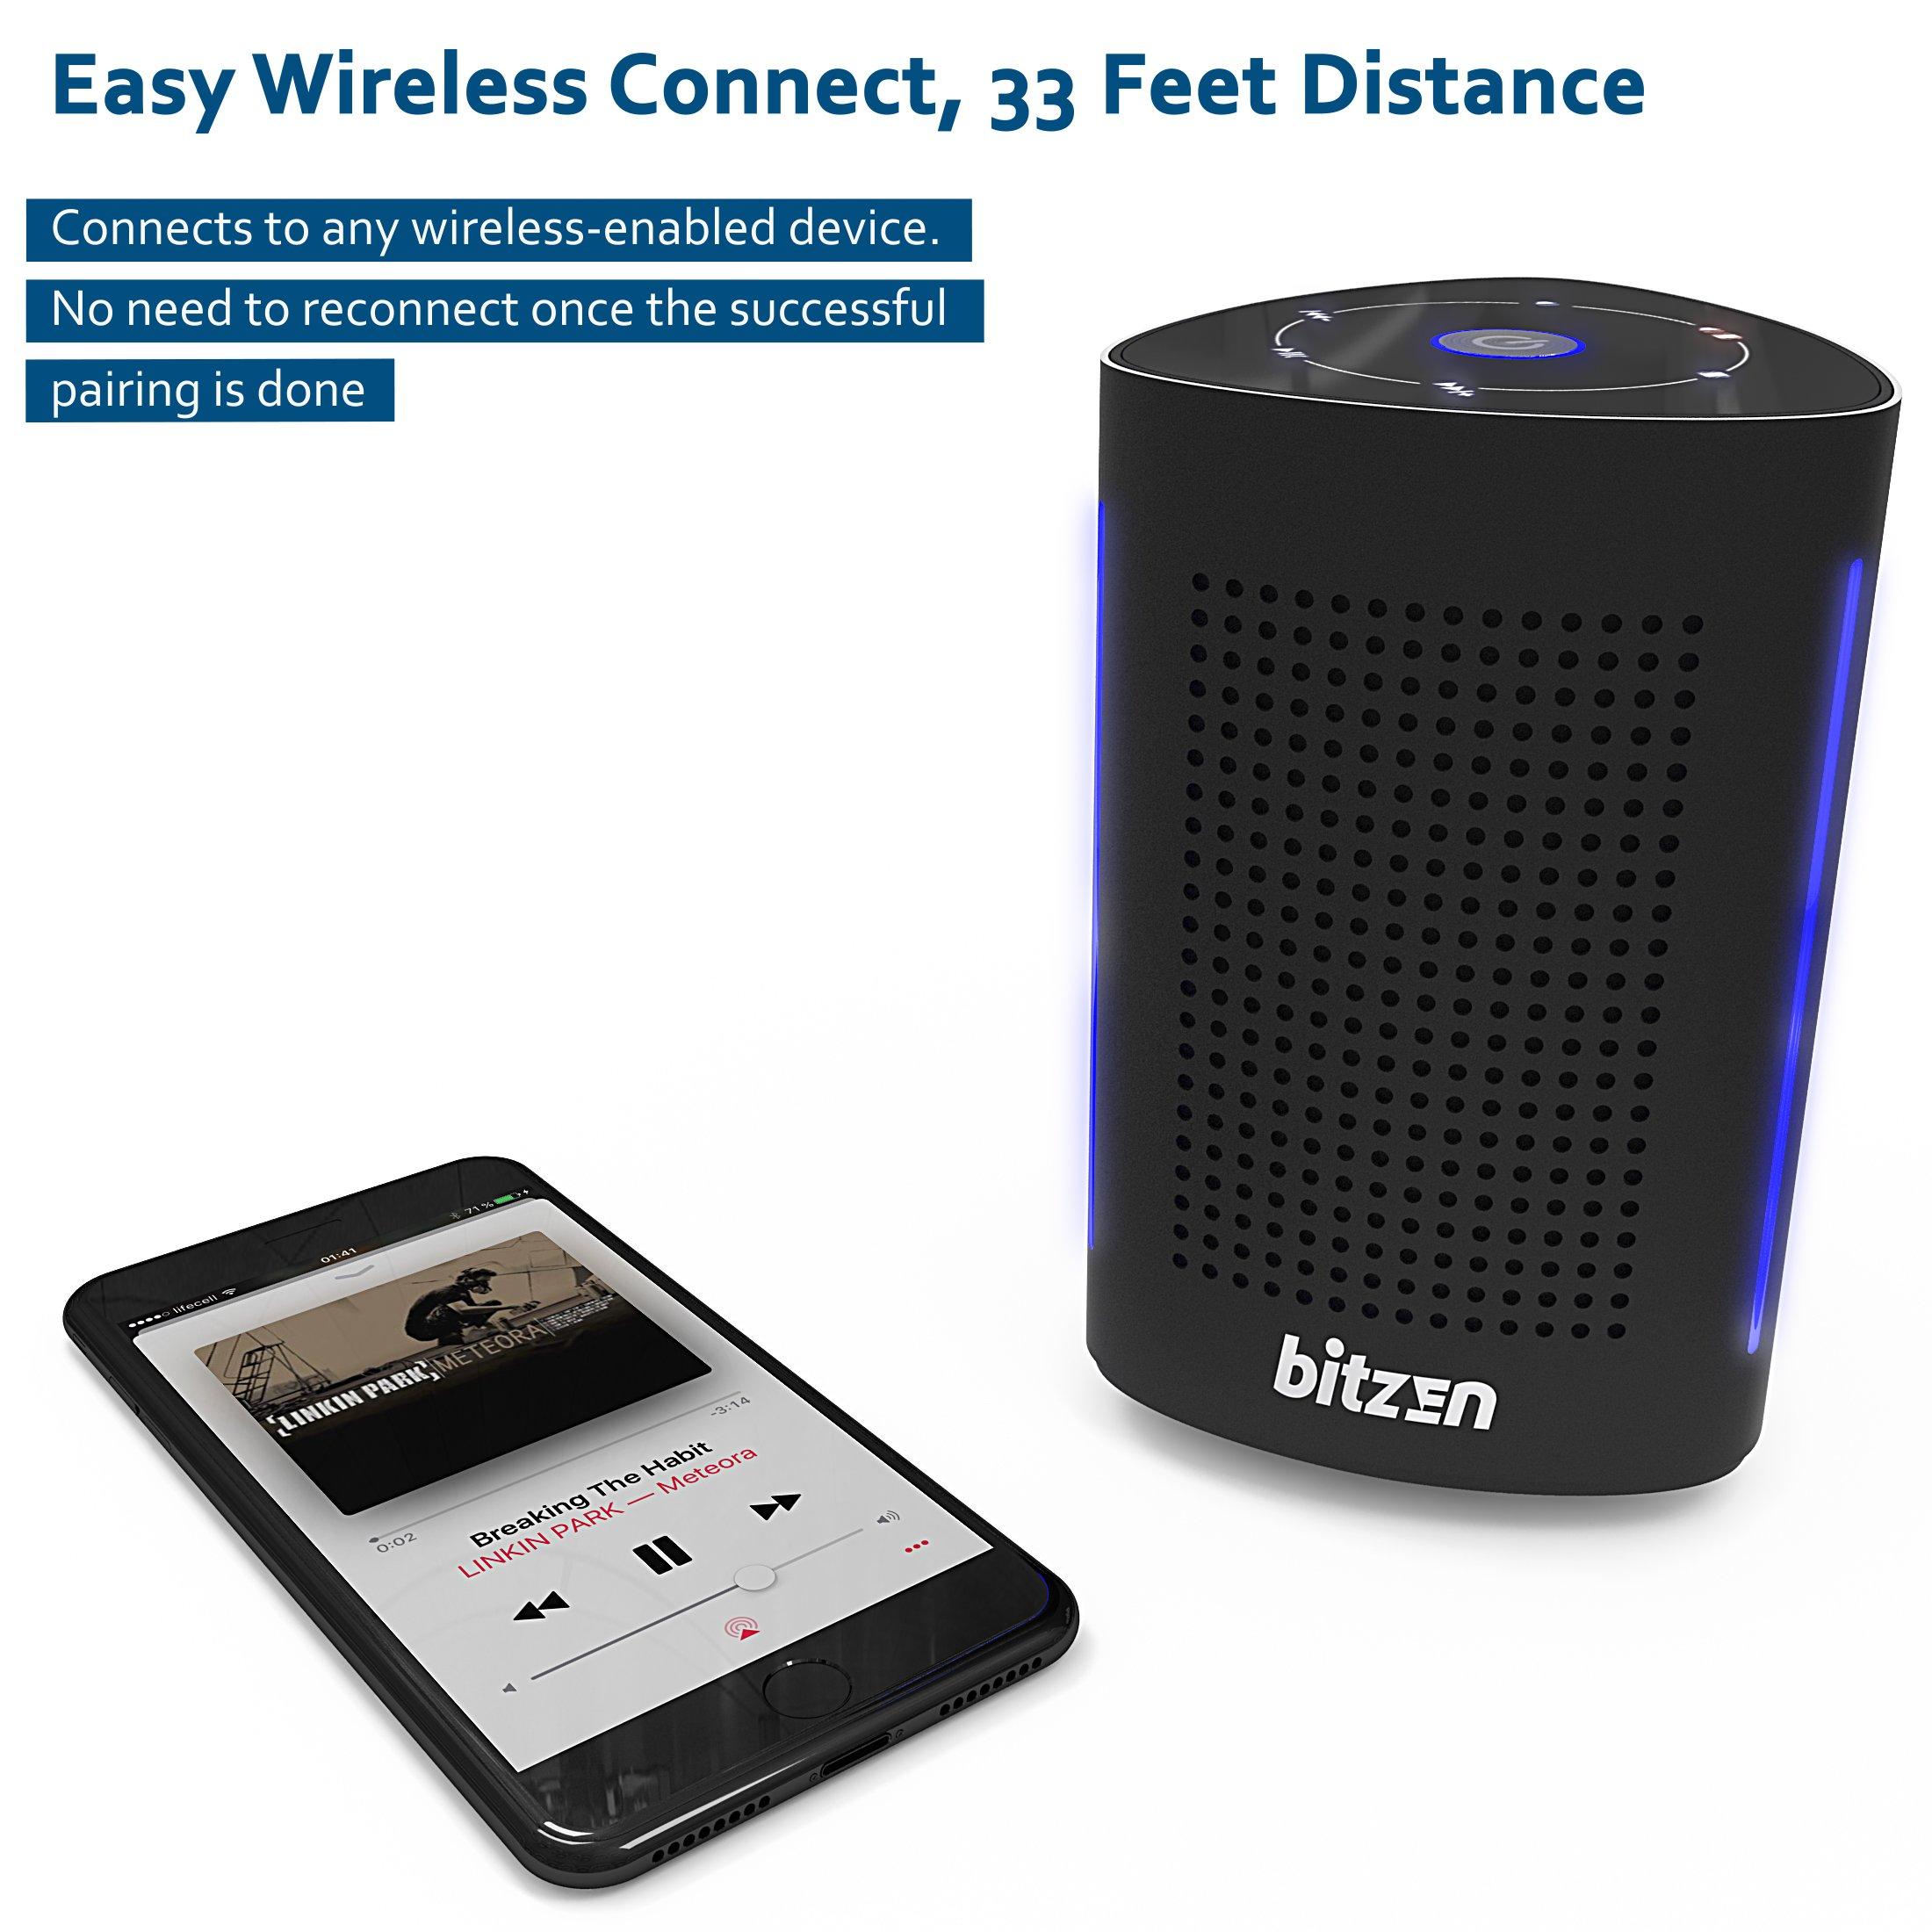 Bluetooth Computer Speaker – Wireless Bluetooth Speaker – Bluetooth Speaker for Women Men – Audio Bluetooth Speaker for iPhone Android Laptop – True Wireless Speakers – Portable Bluetooth Speakers by Bitzen (Image #8)